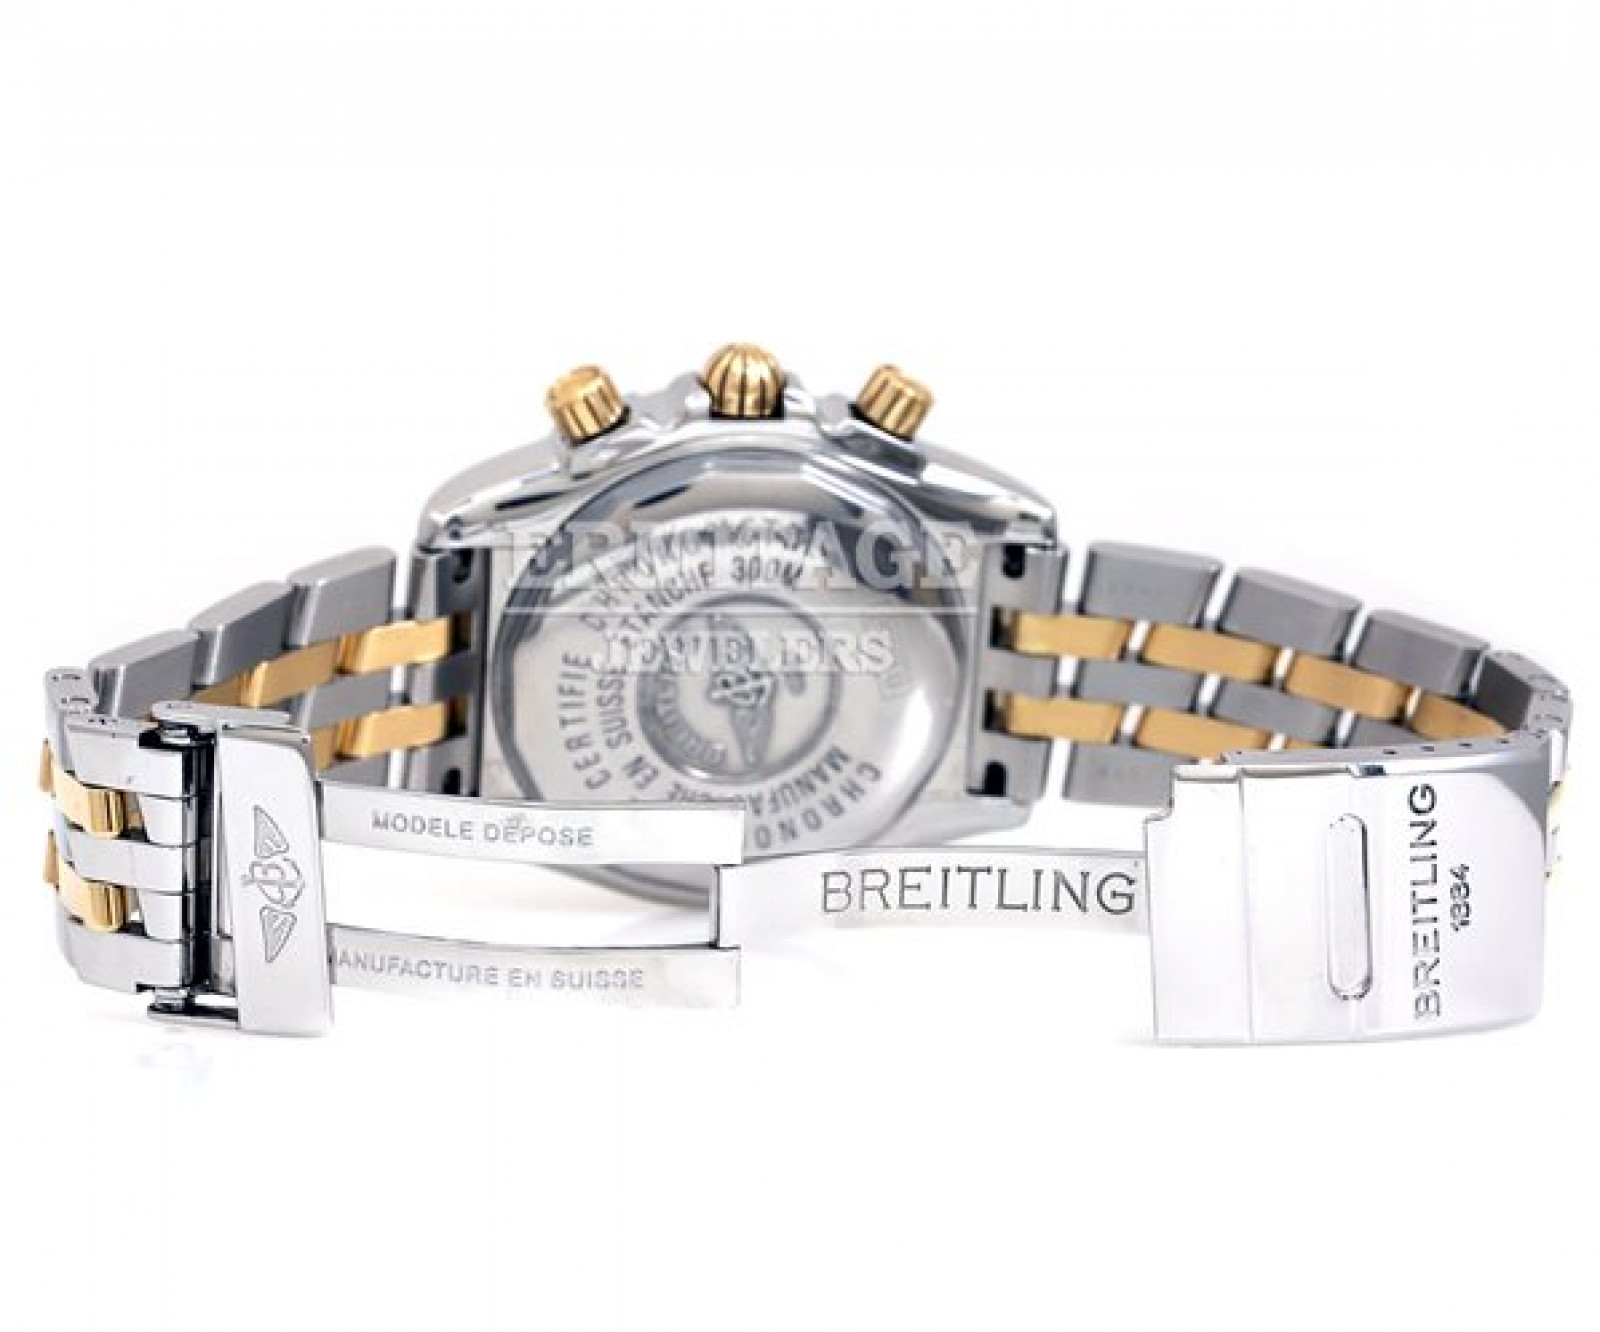 Breitling Evolution B13356 Gold & Steel